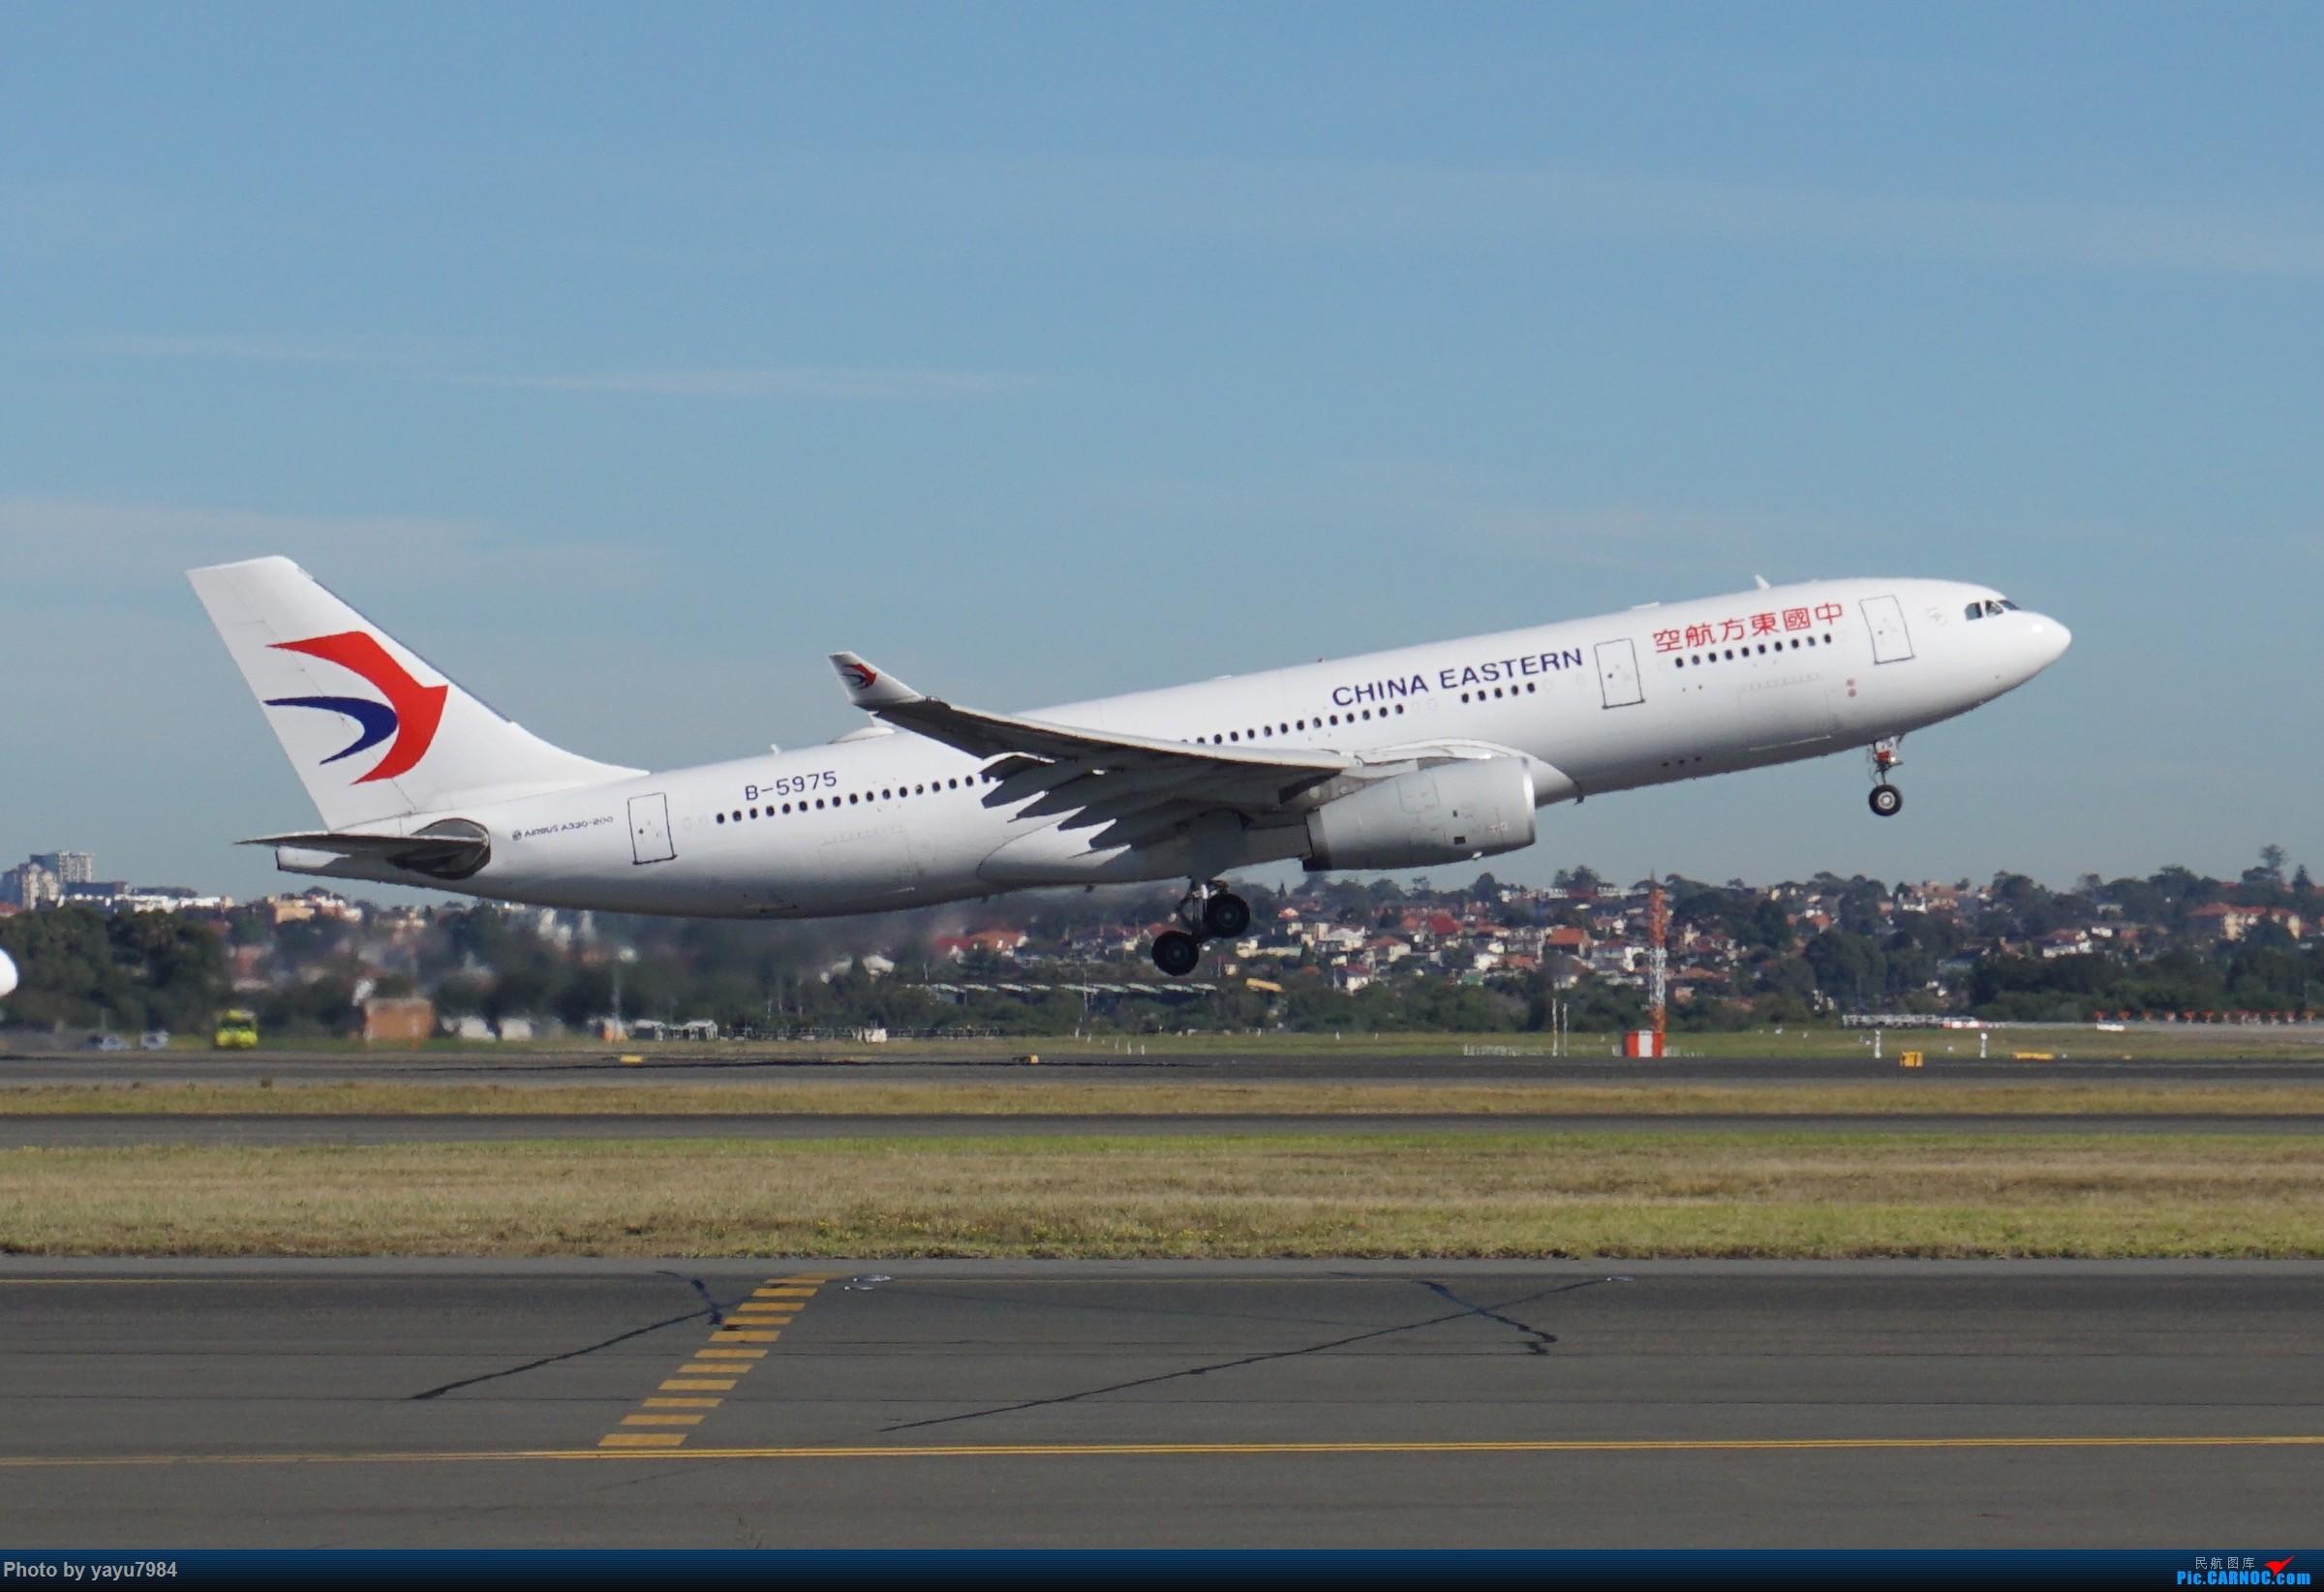 Re:[原创][SYD] 晨悉尼,Blu Emu停车场里拍34L起飞以及滑行 AIRBUS A330-200 B-5975 澳大利亚悉尼金斯福德·史密斯机场